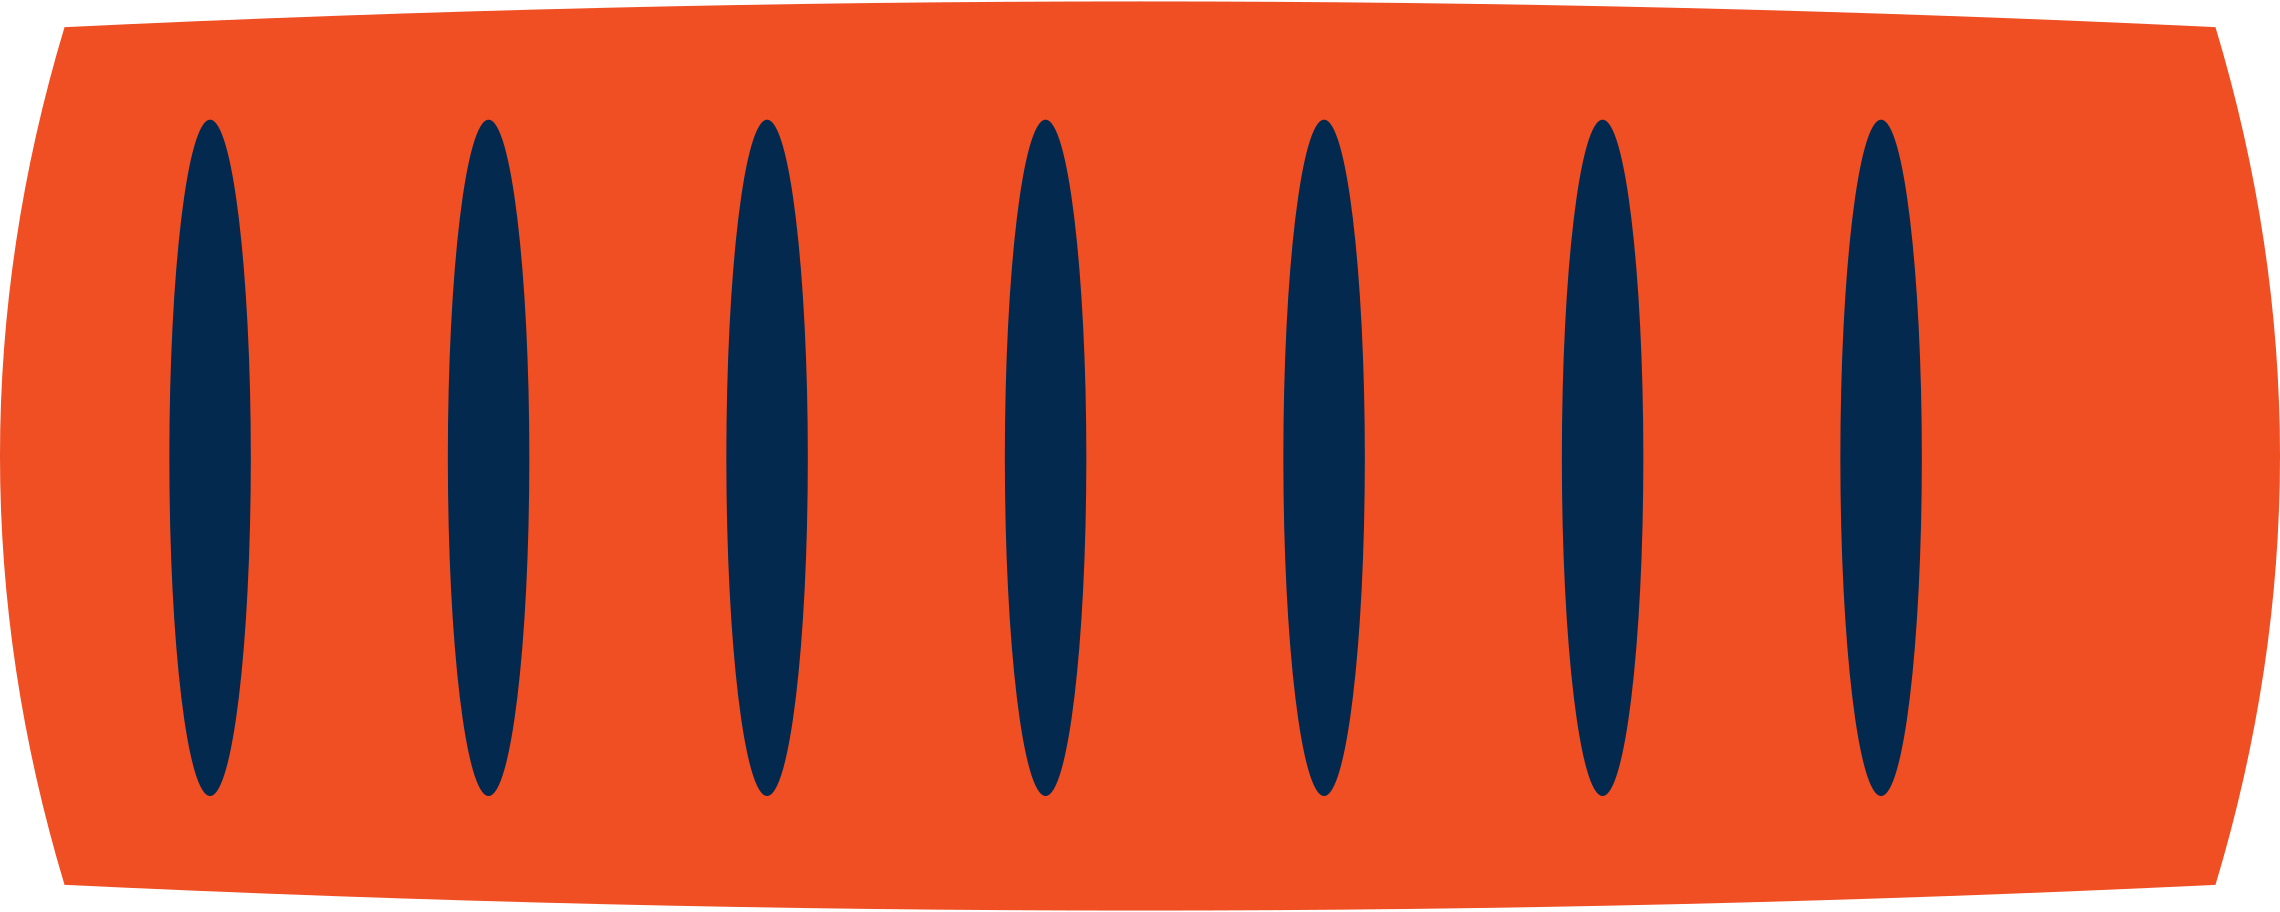 chips pile Clipart illustration in PNG, SVG